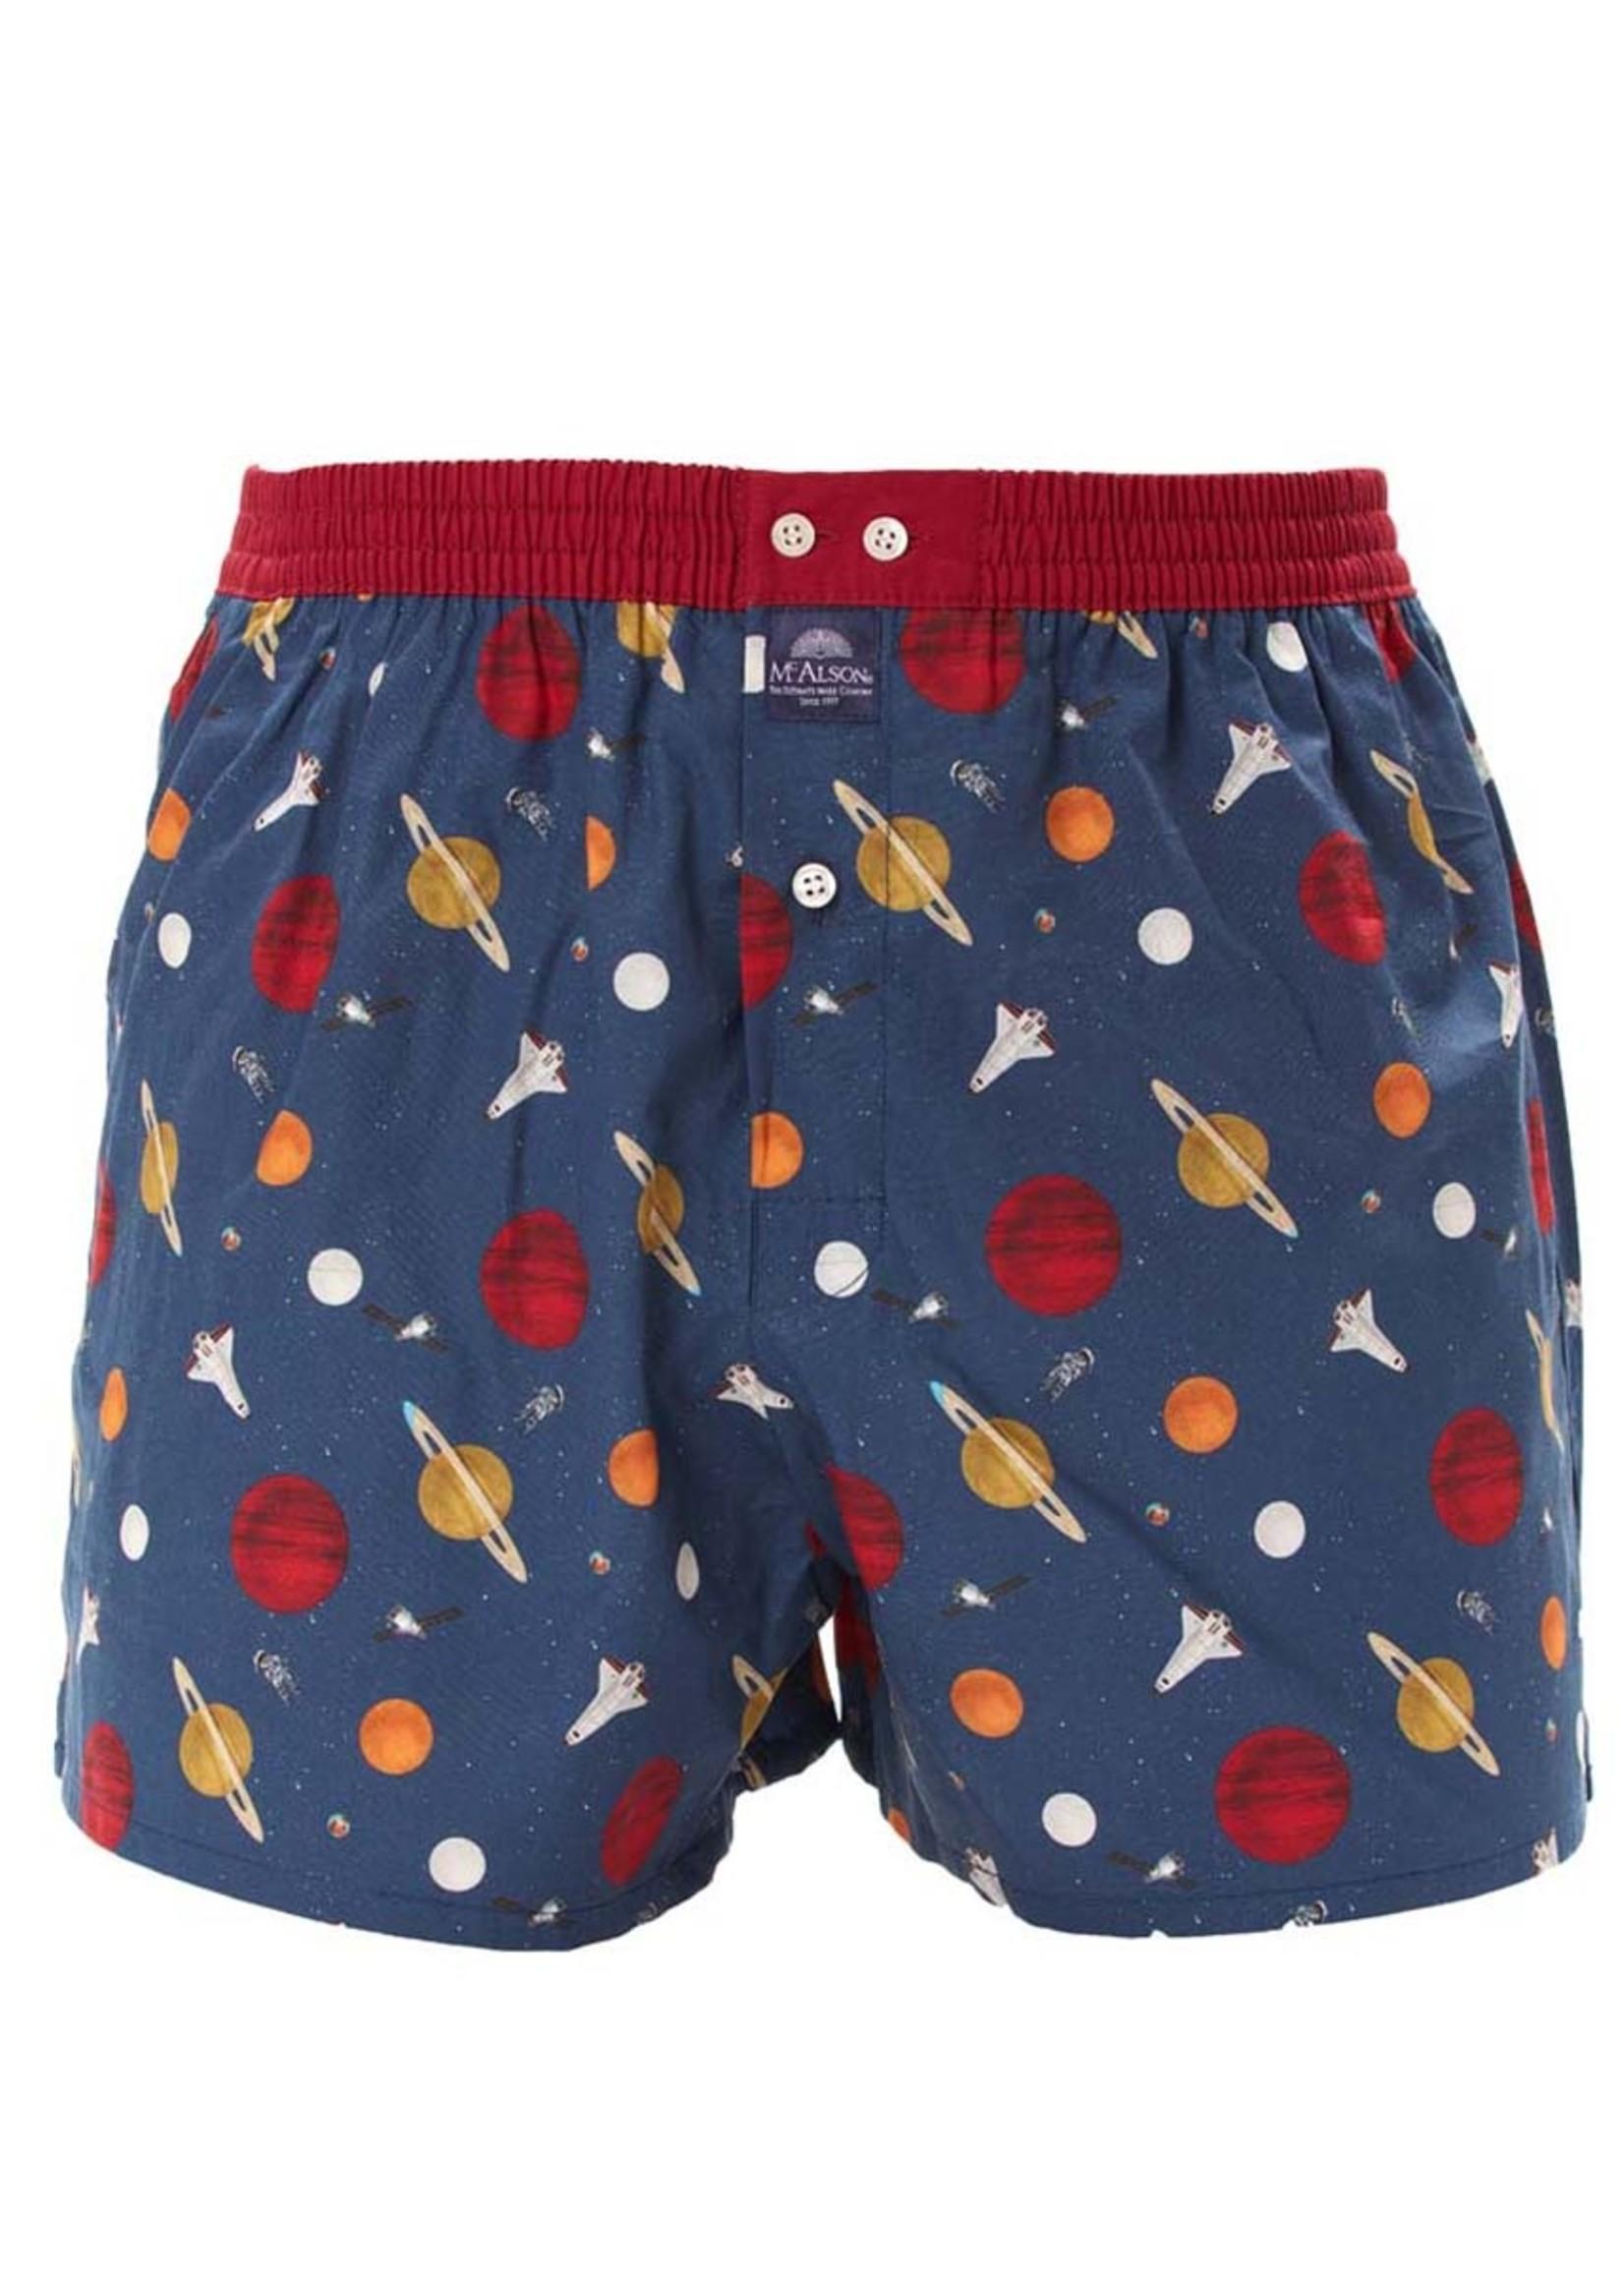 Mc Alson M4458 - Planets navy